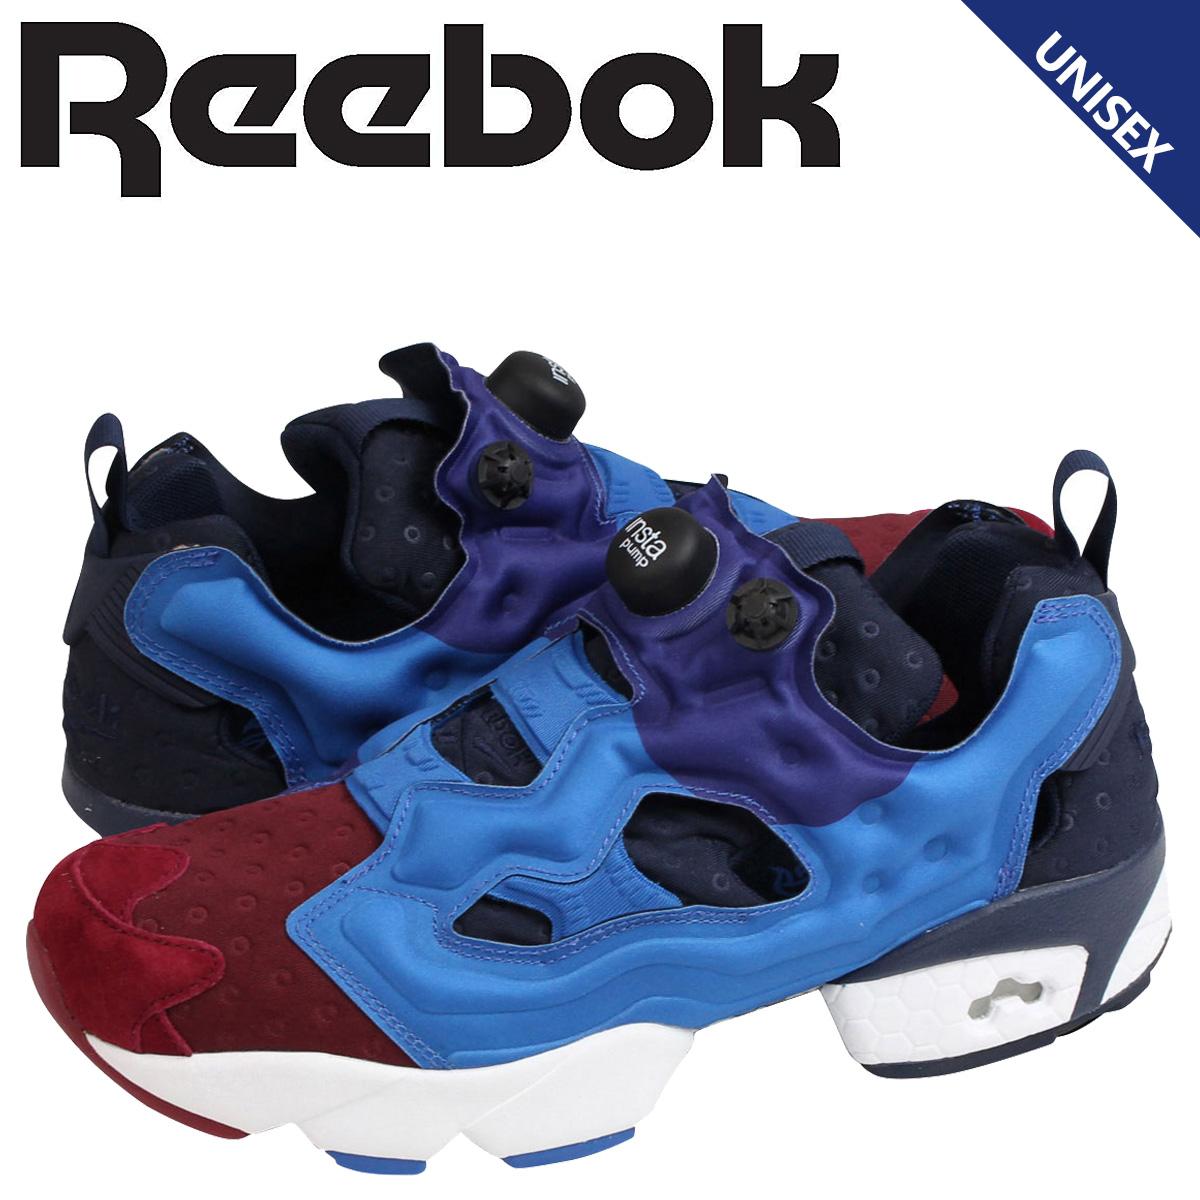 8ace62d1 Sugar Online Shop: Reebok Reebok INSTA PUMP FURY OG SAXE BLUE ...